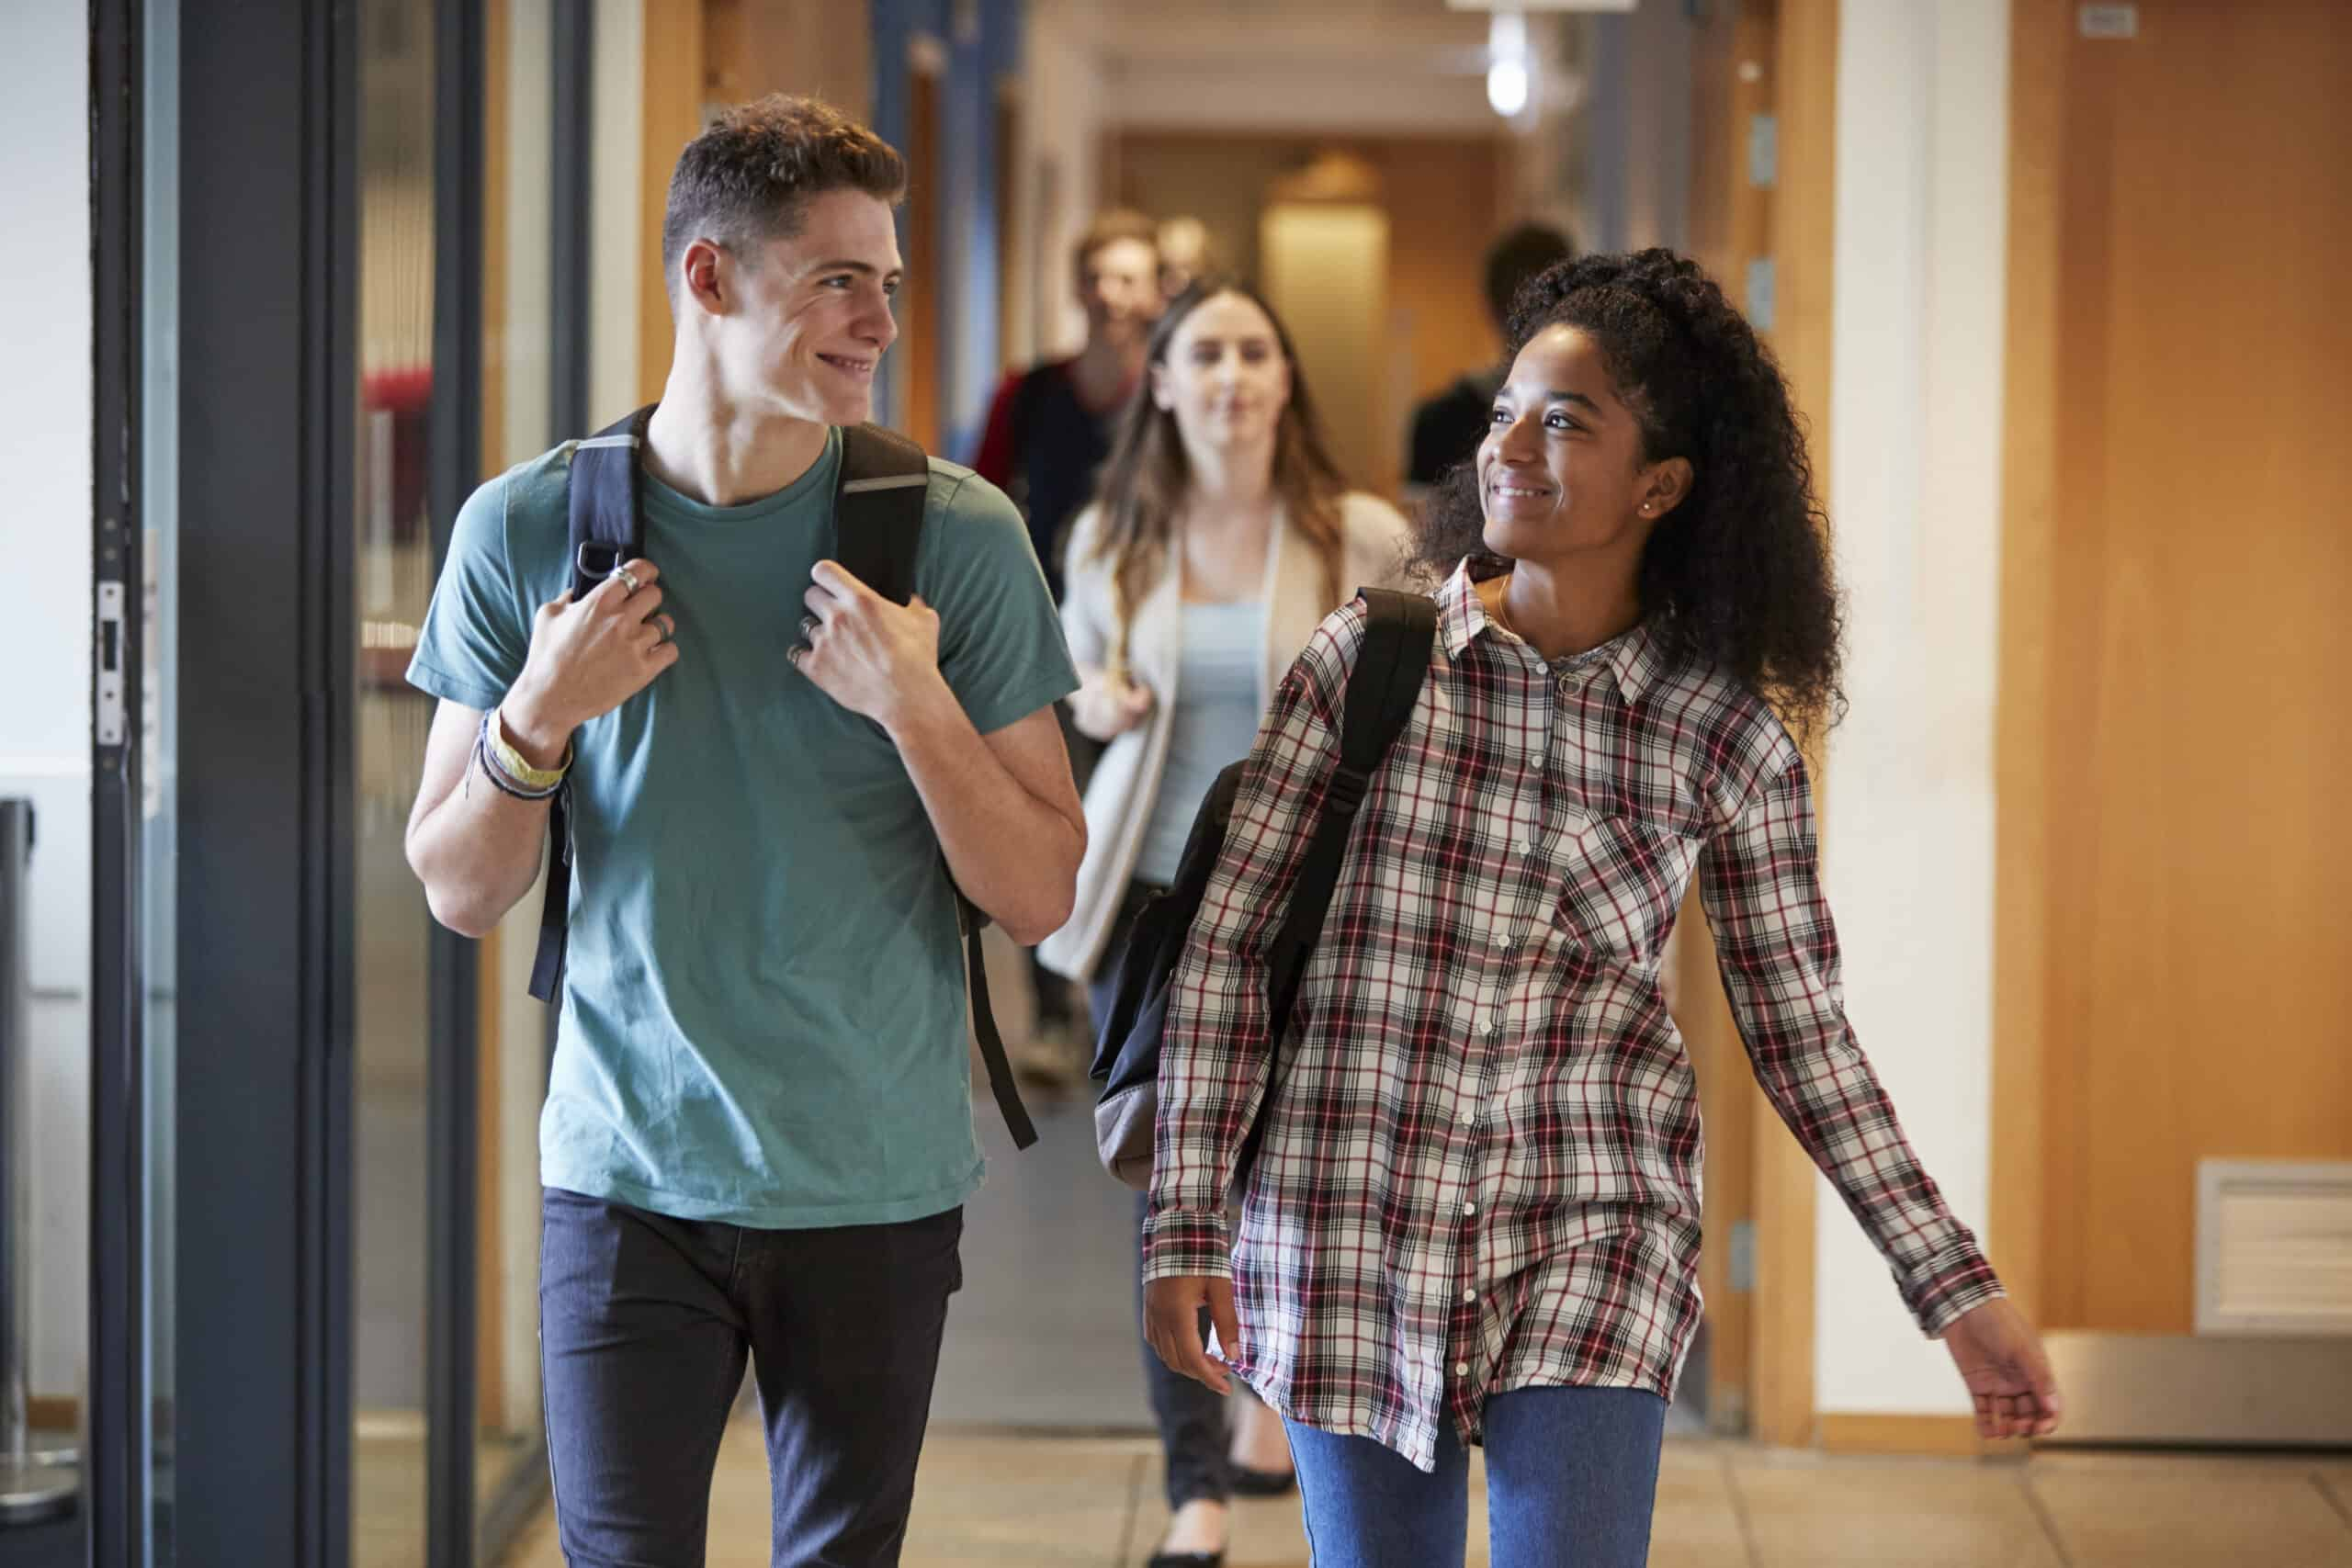 Academic Adviser – Love 'um or Leave 'um